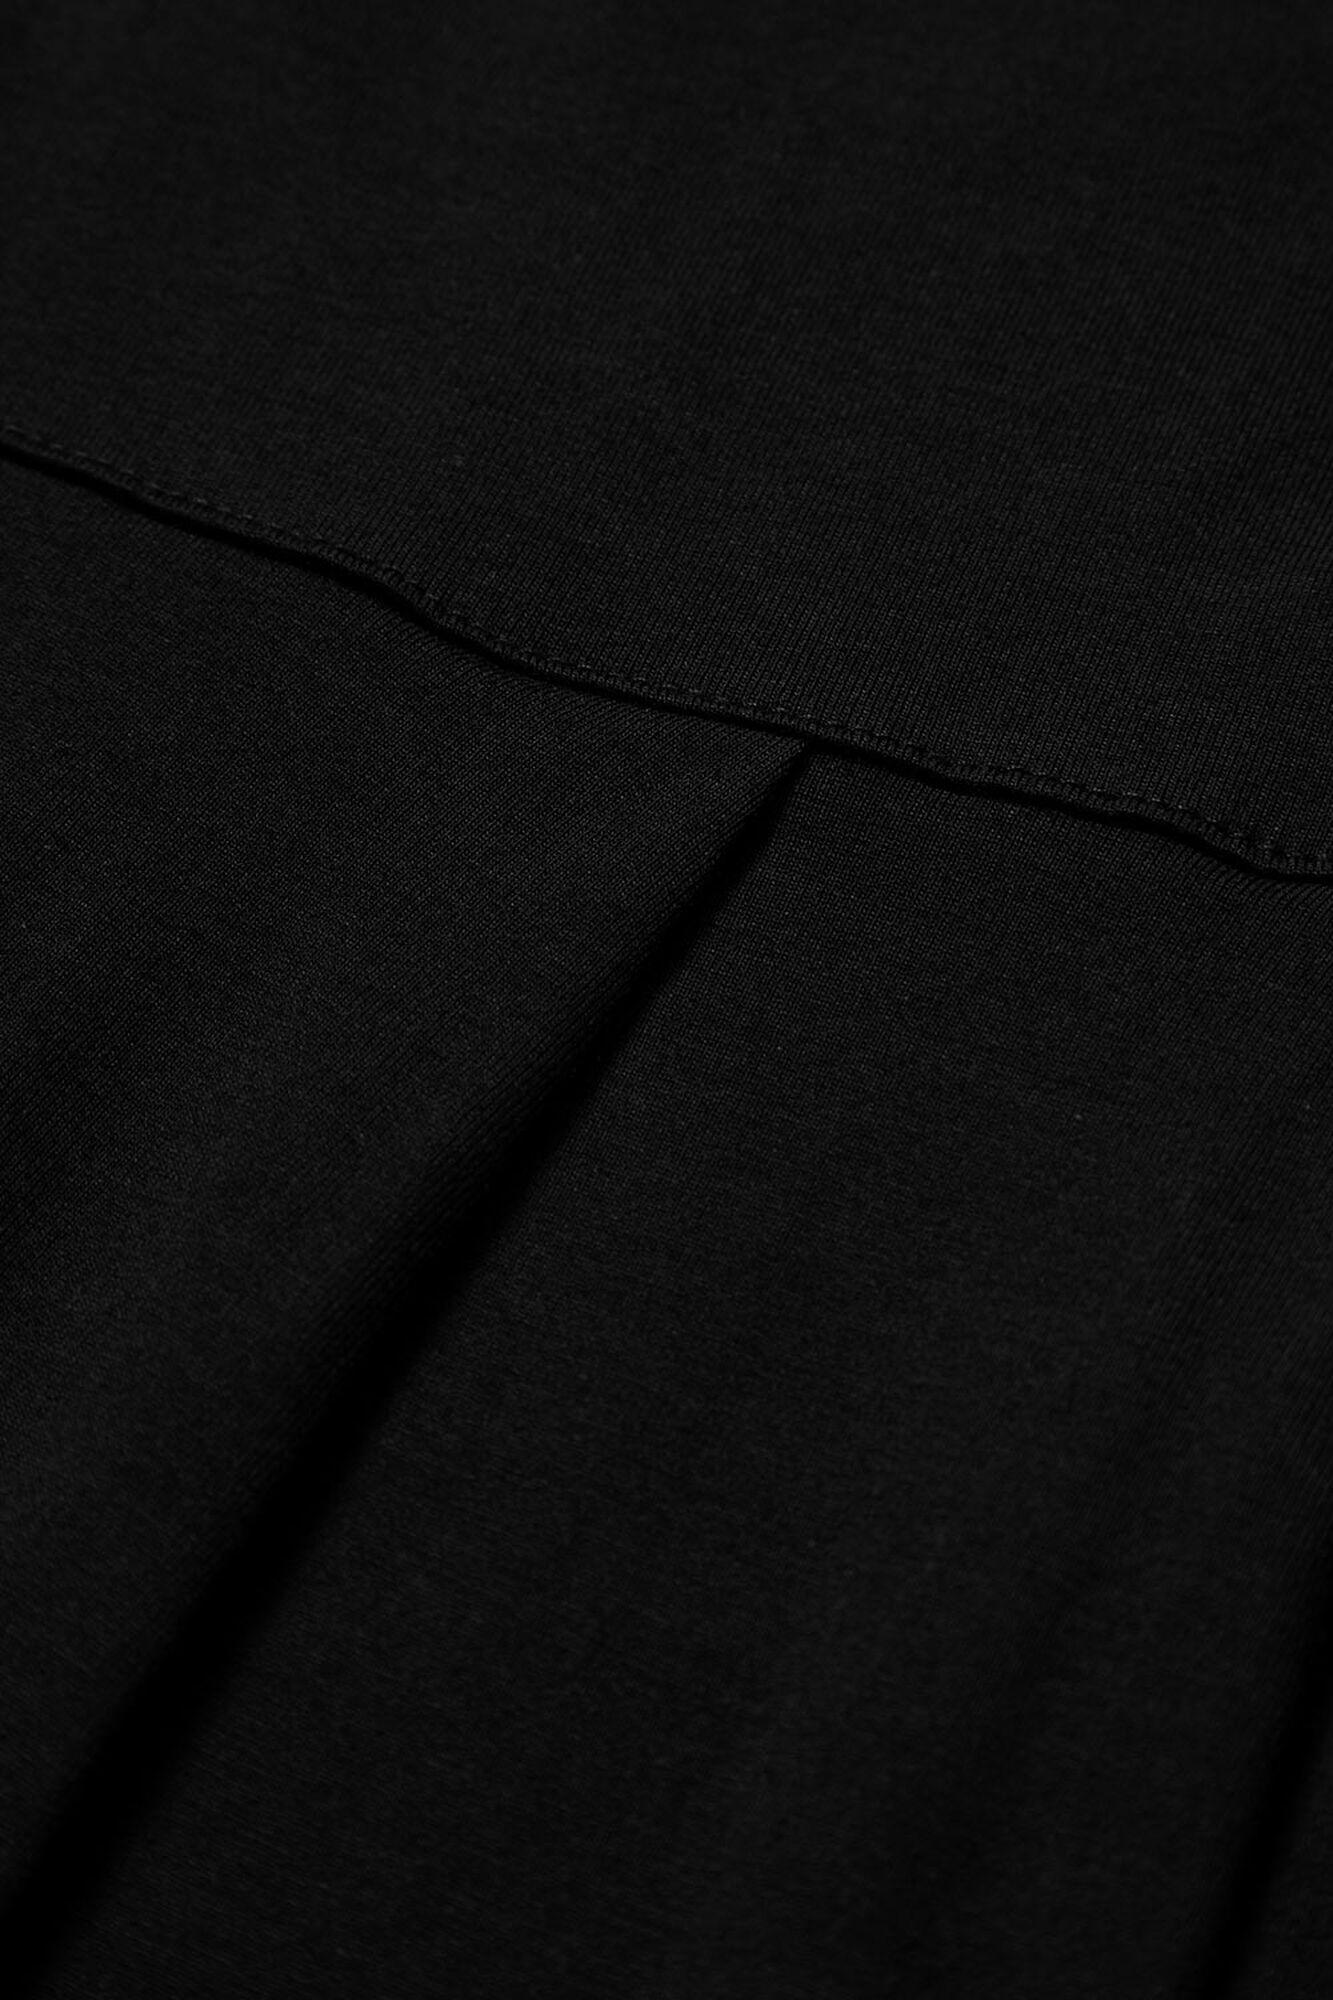 NETTASSA JERSEY JUMPSUIT, Black, hi-res